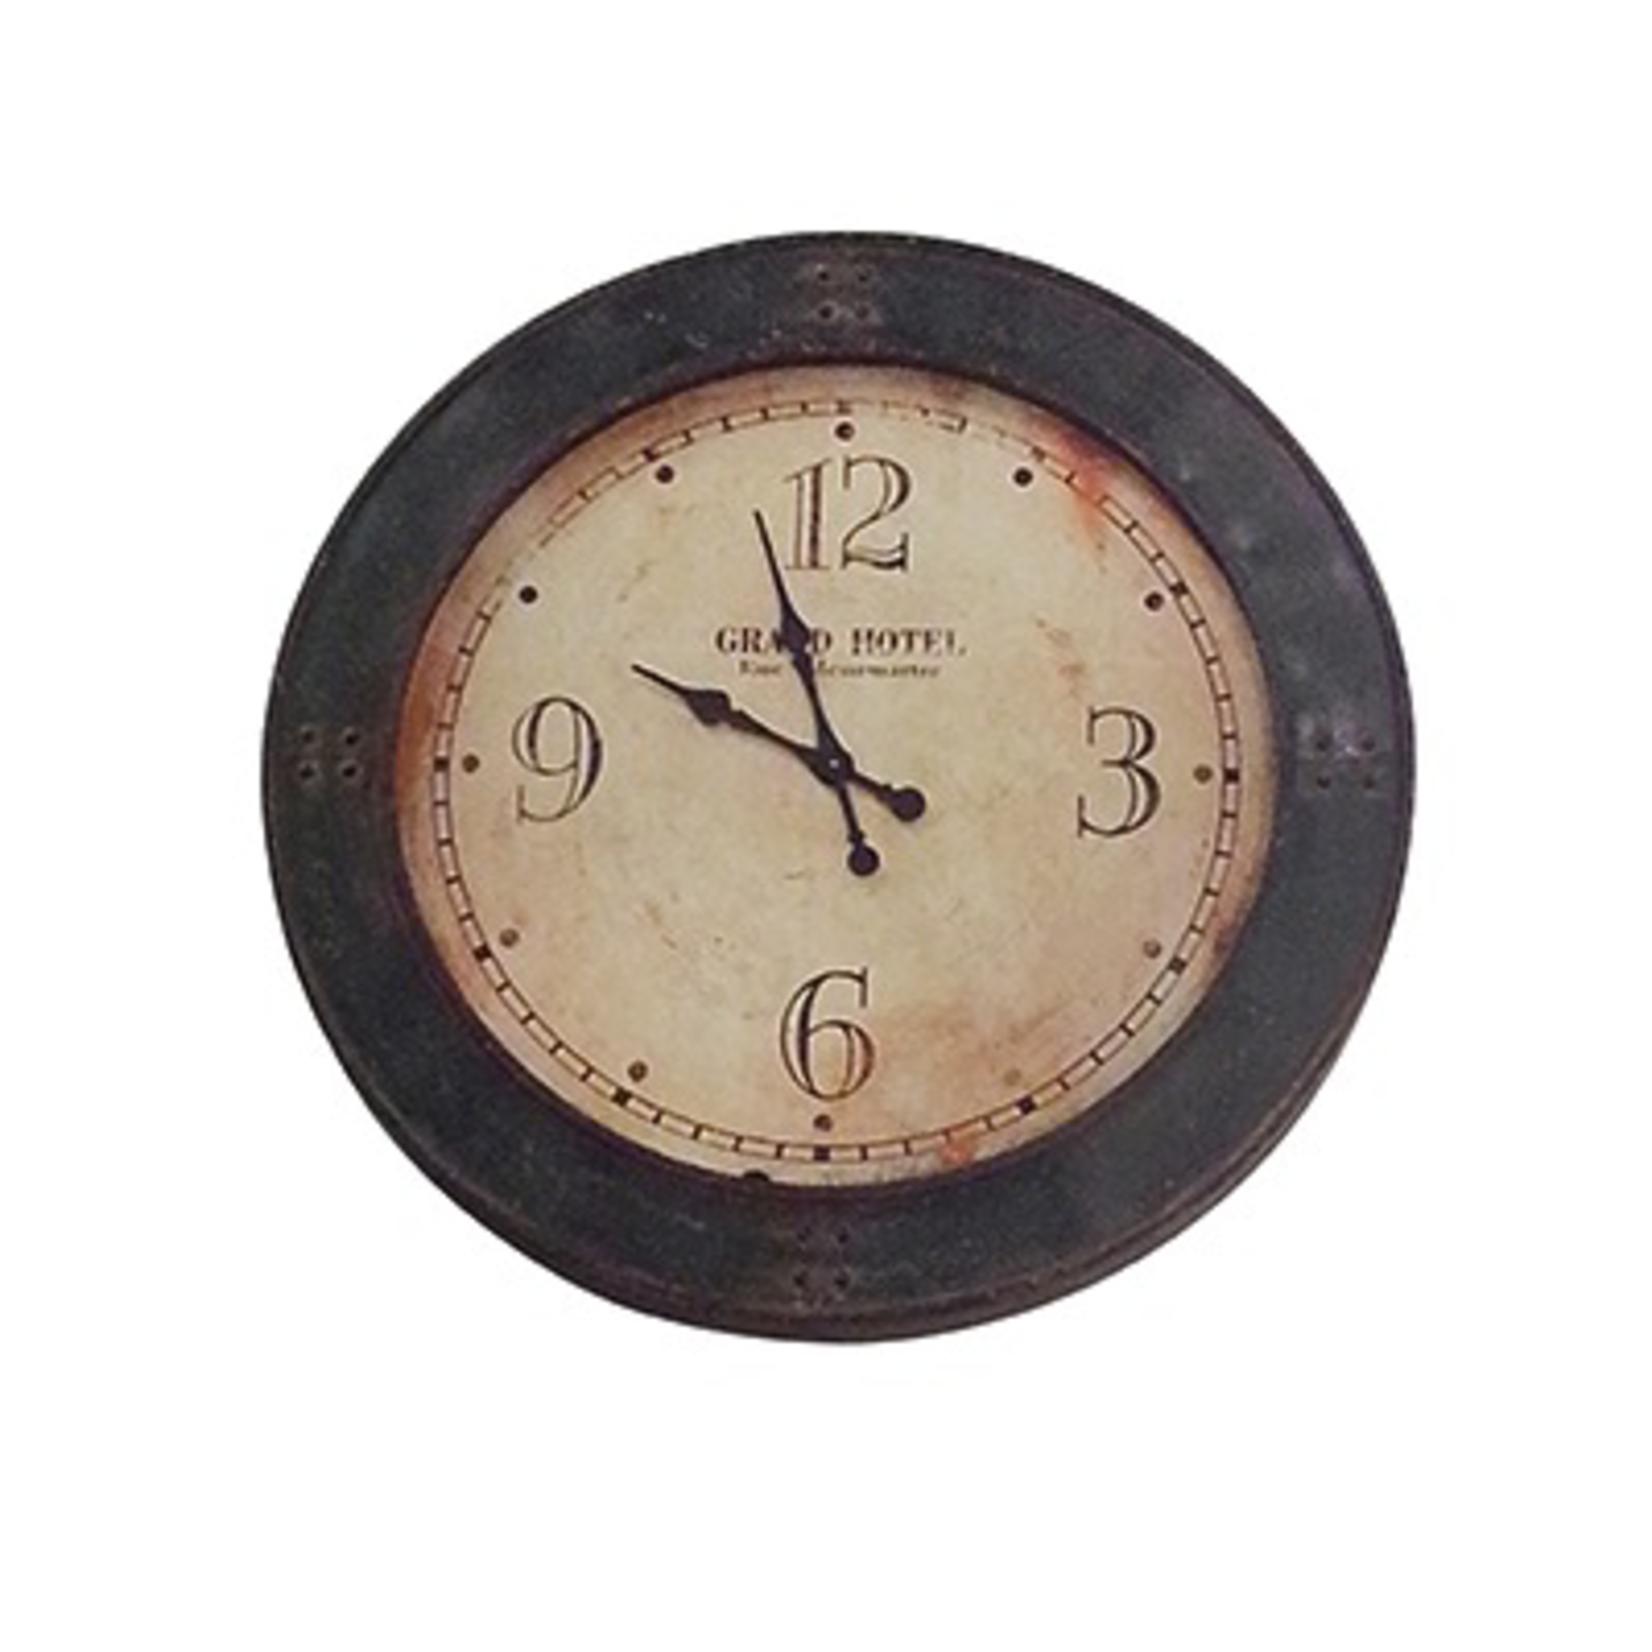 CHEHOMA IRON CLOCK  GRAND HTEL